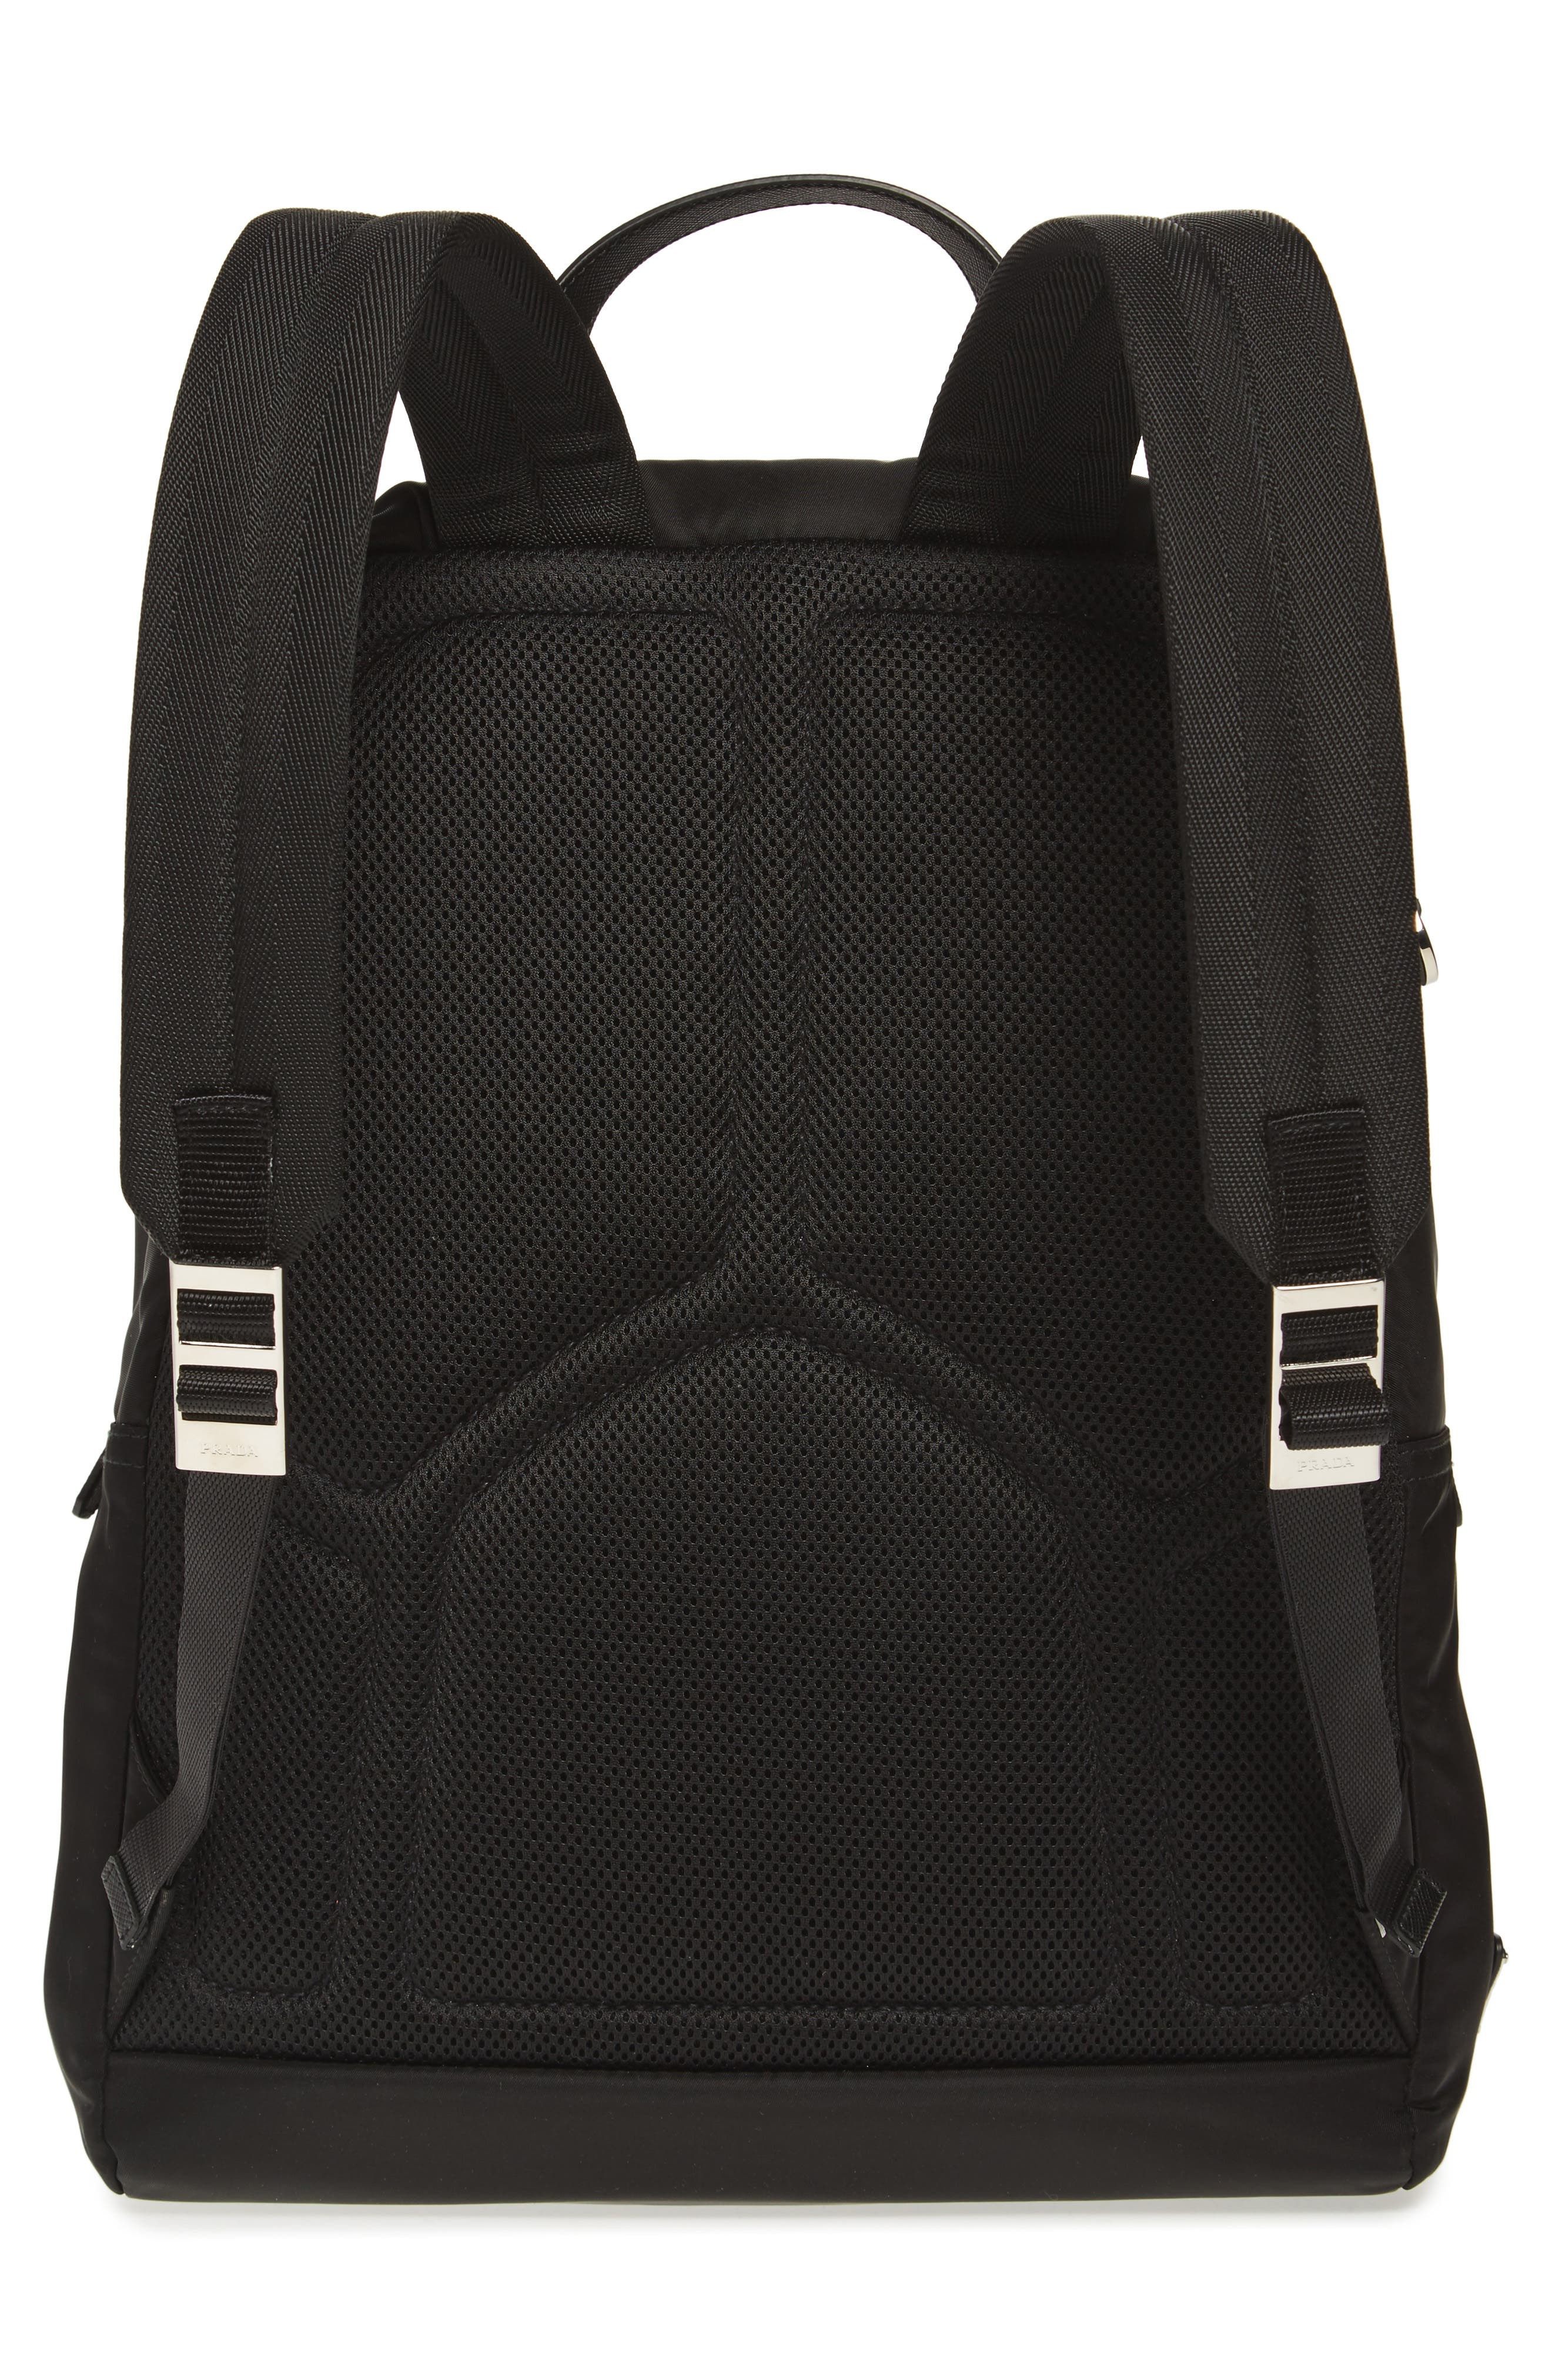 Robot Backpack,                             Alternate thumbnail 3, color,                             907